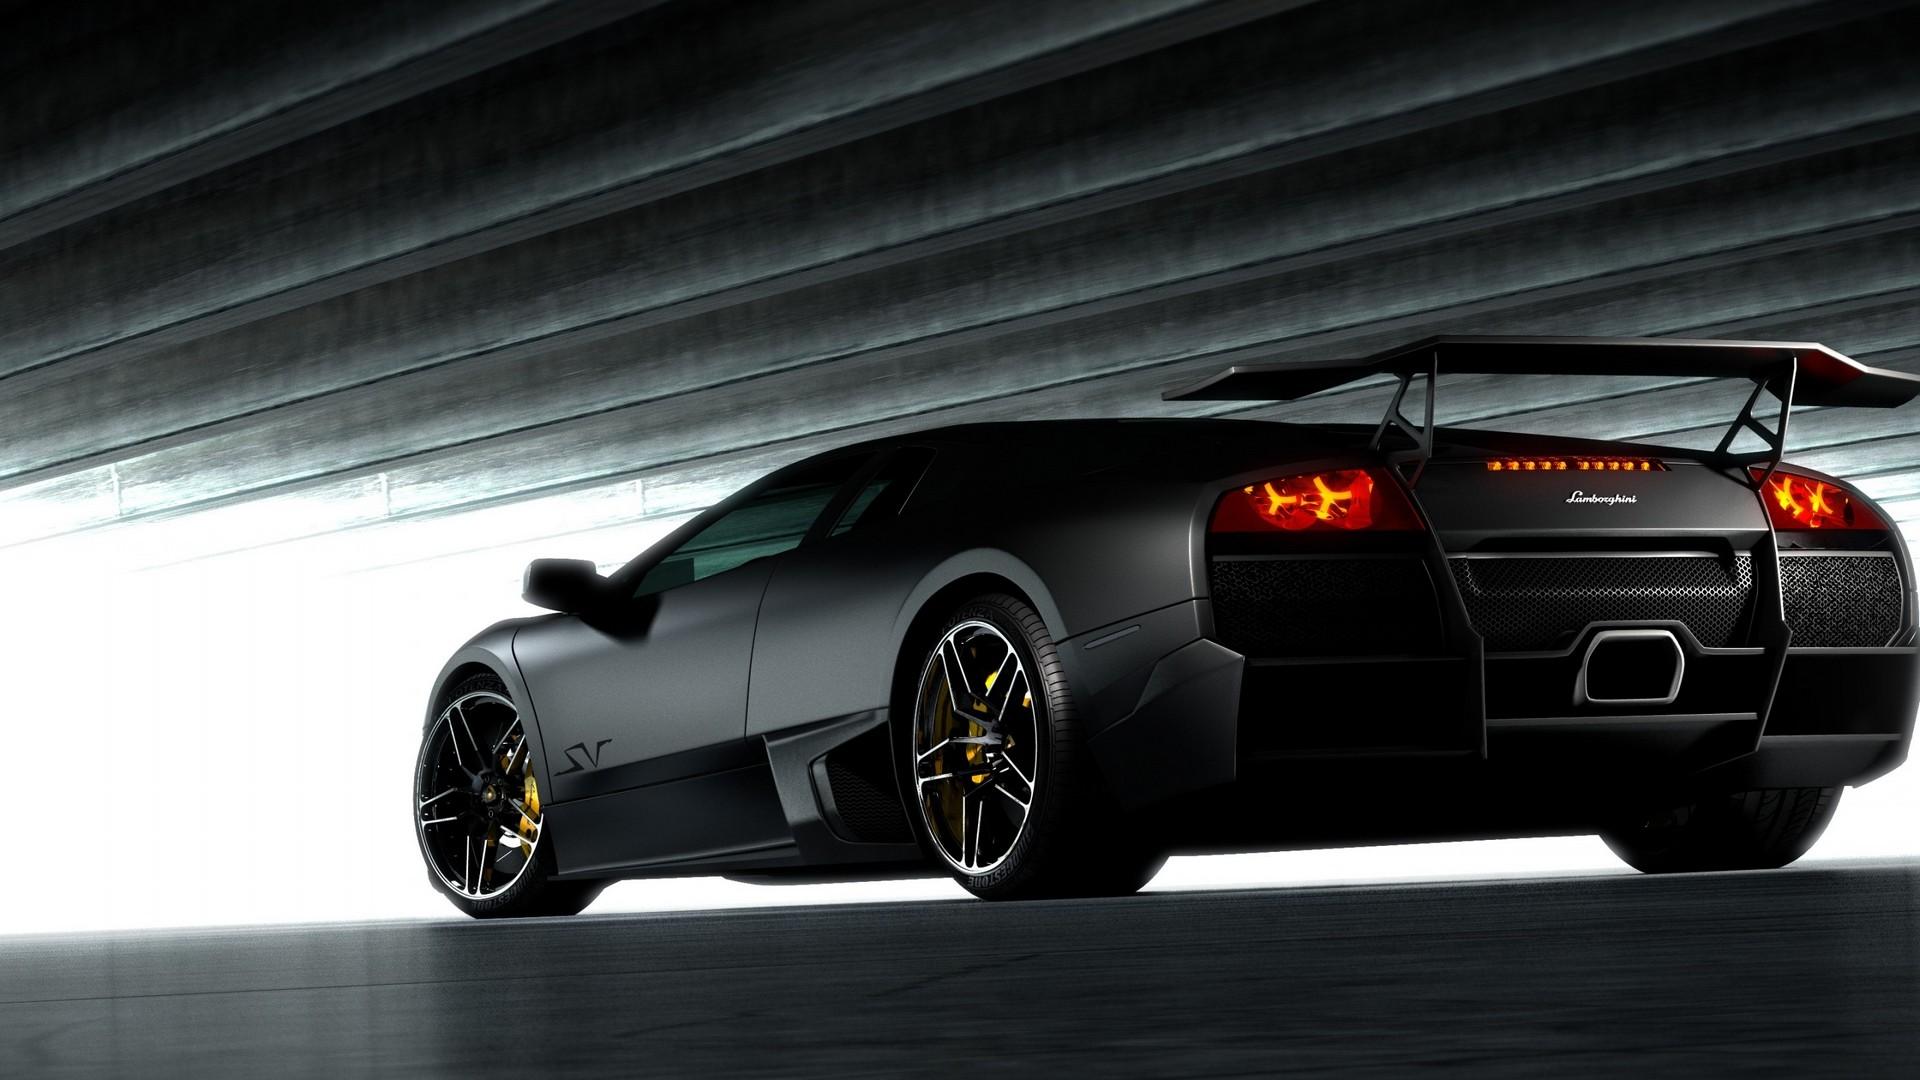 Lamborghini Gallardo Wallpaper Hd 74 Images